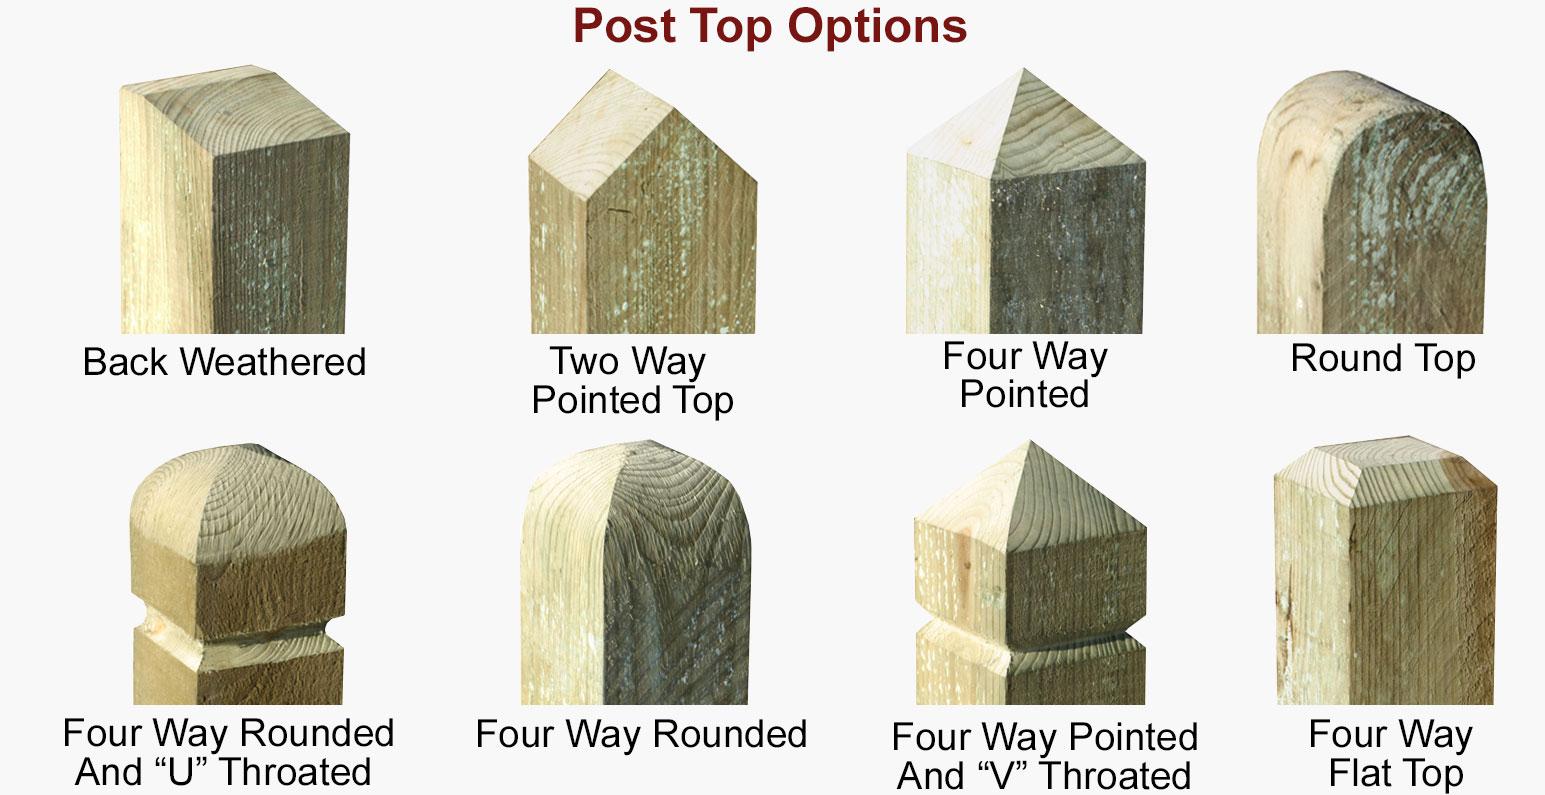 Post top options for standard closeboard fencing